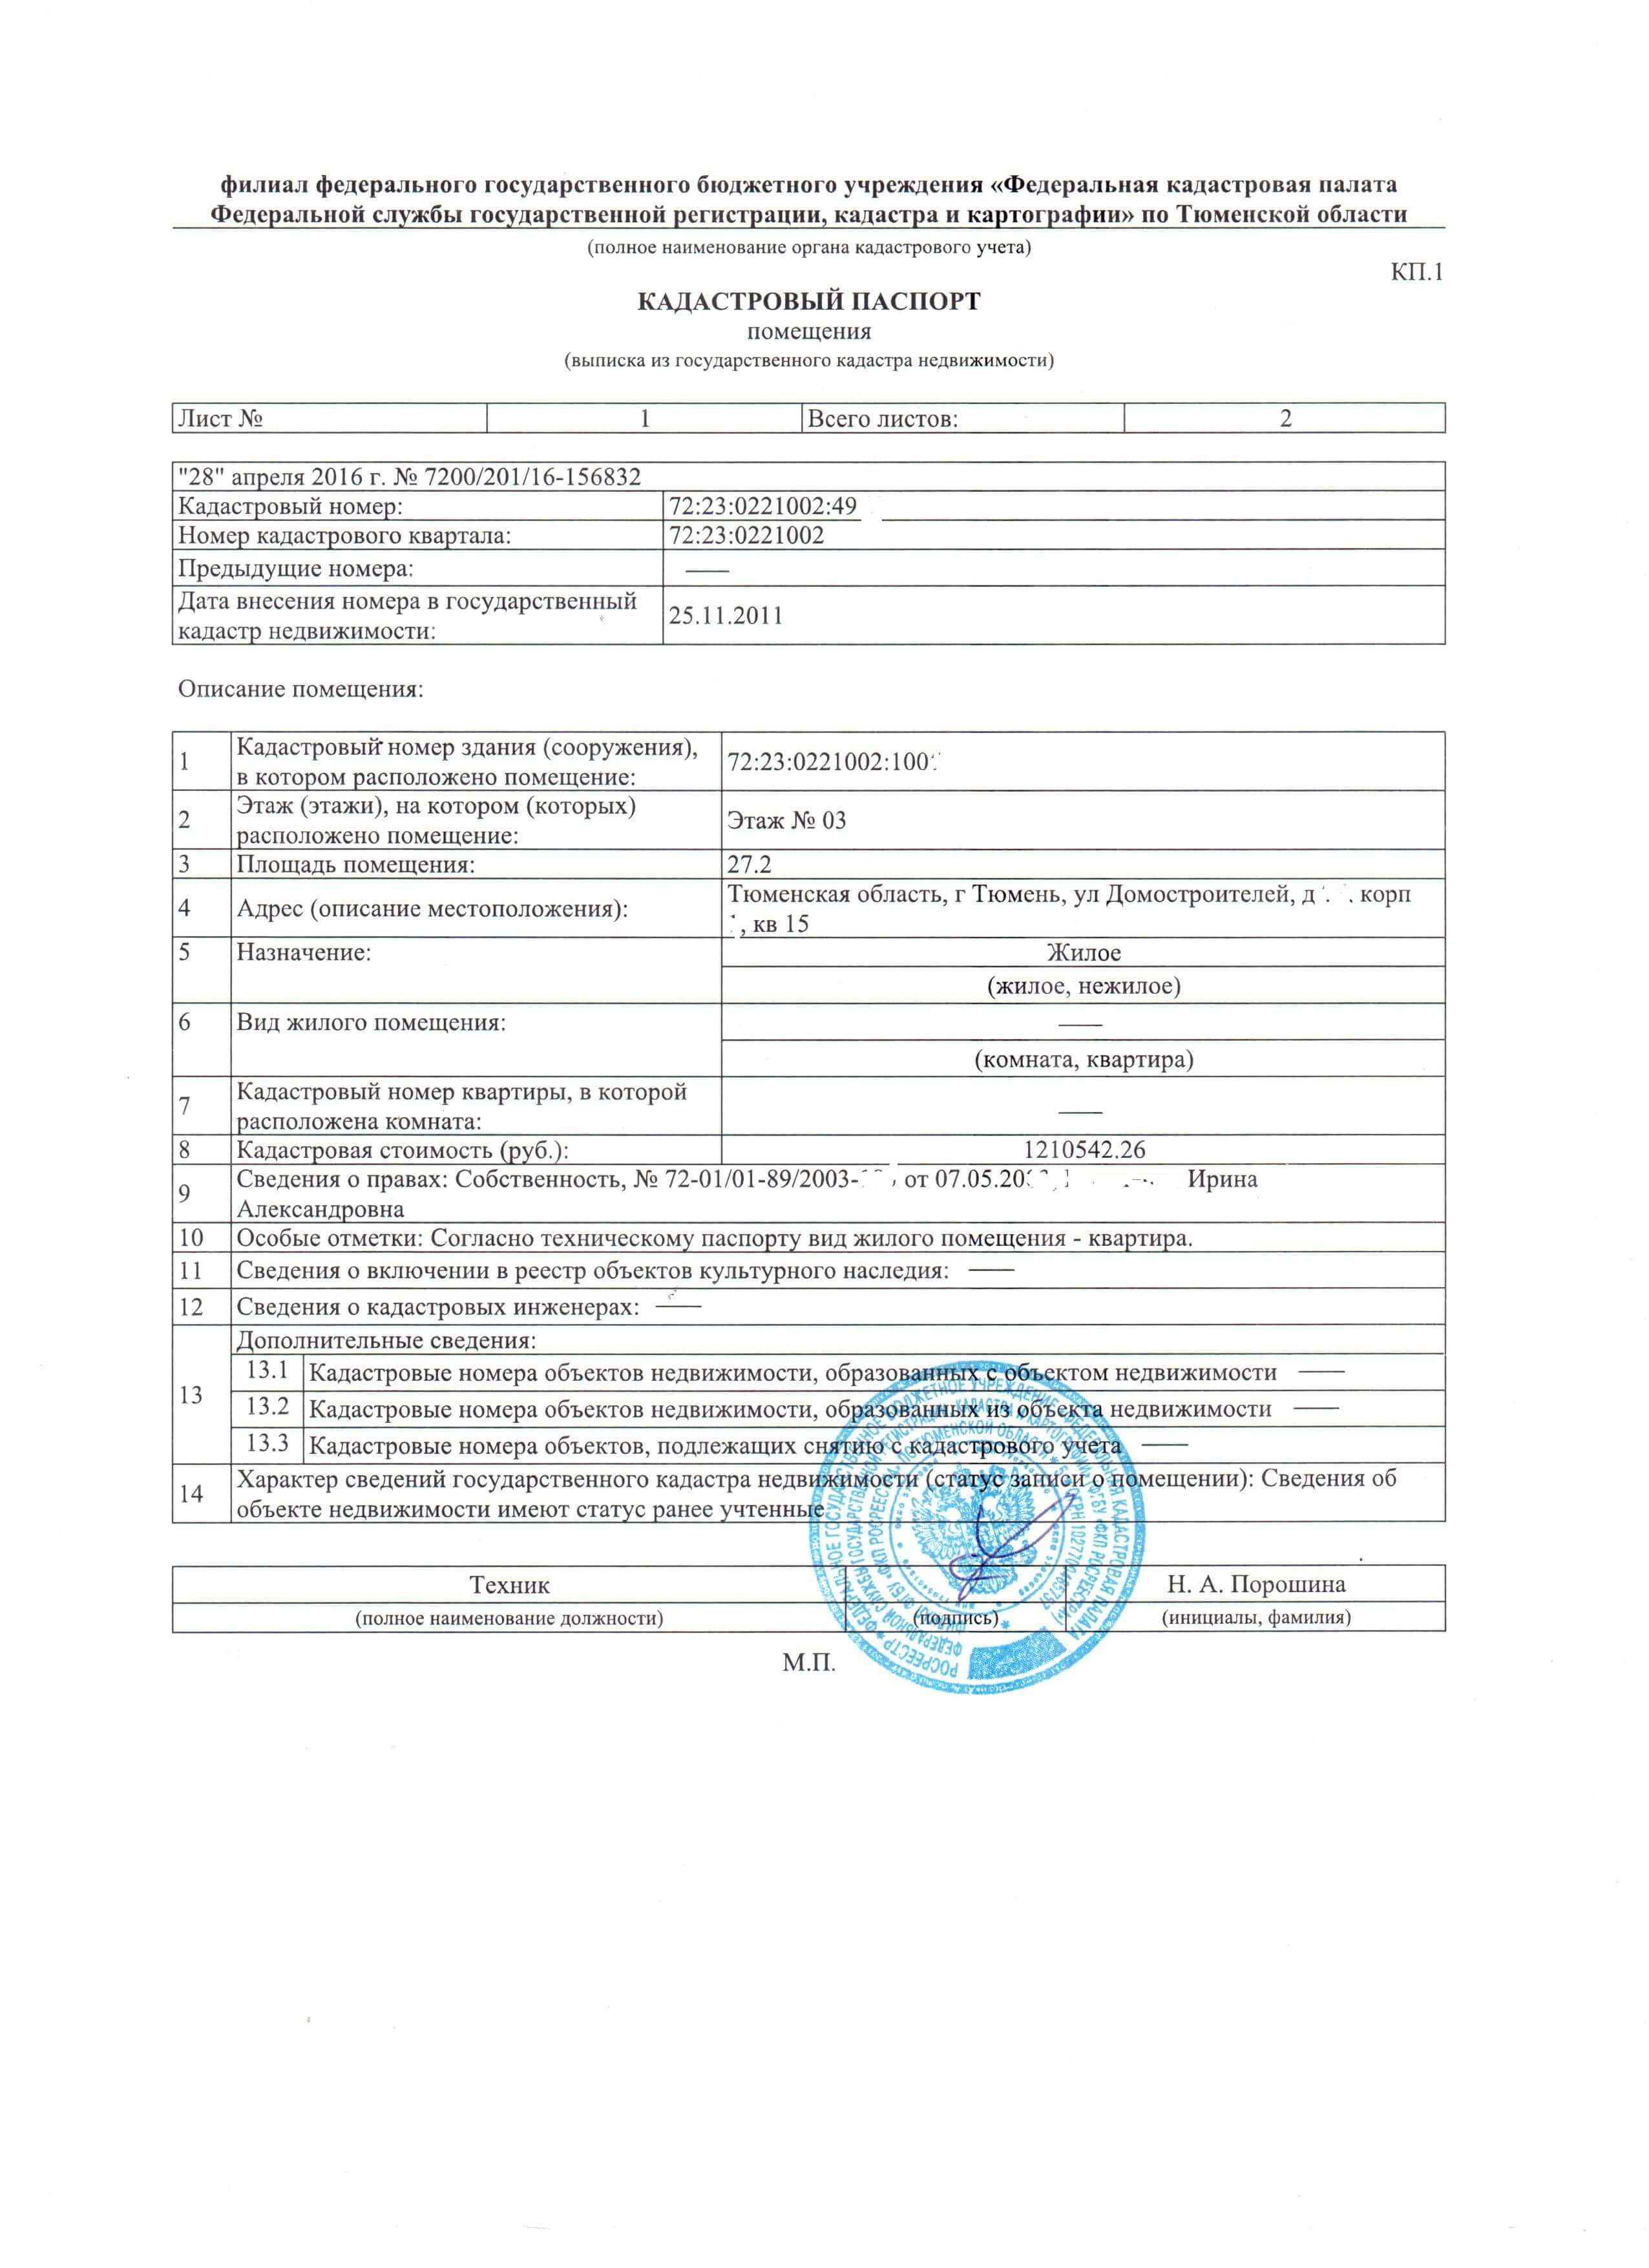 Нужен ли кадастровый паспорт при дарении квартиры